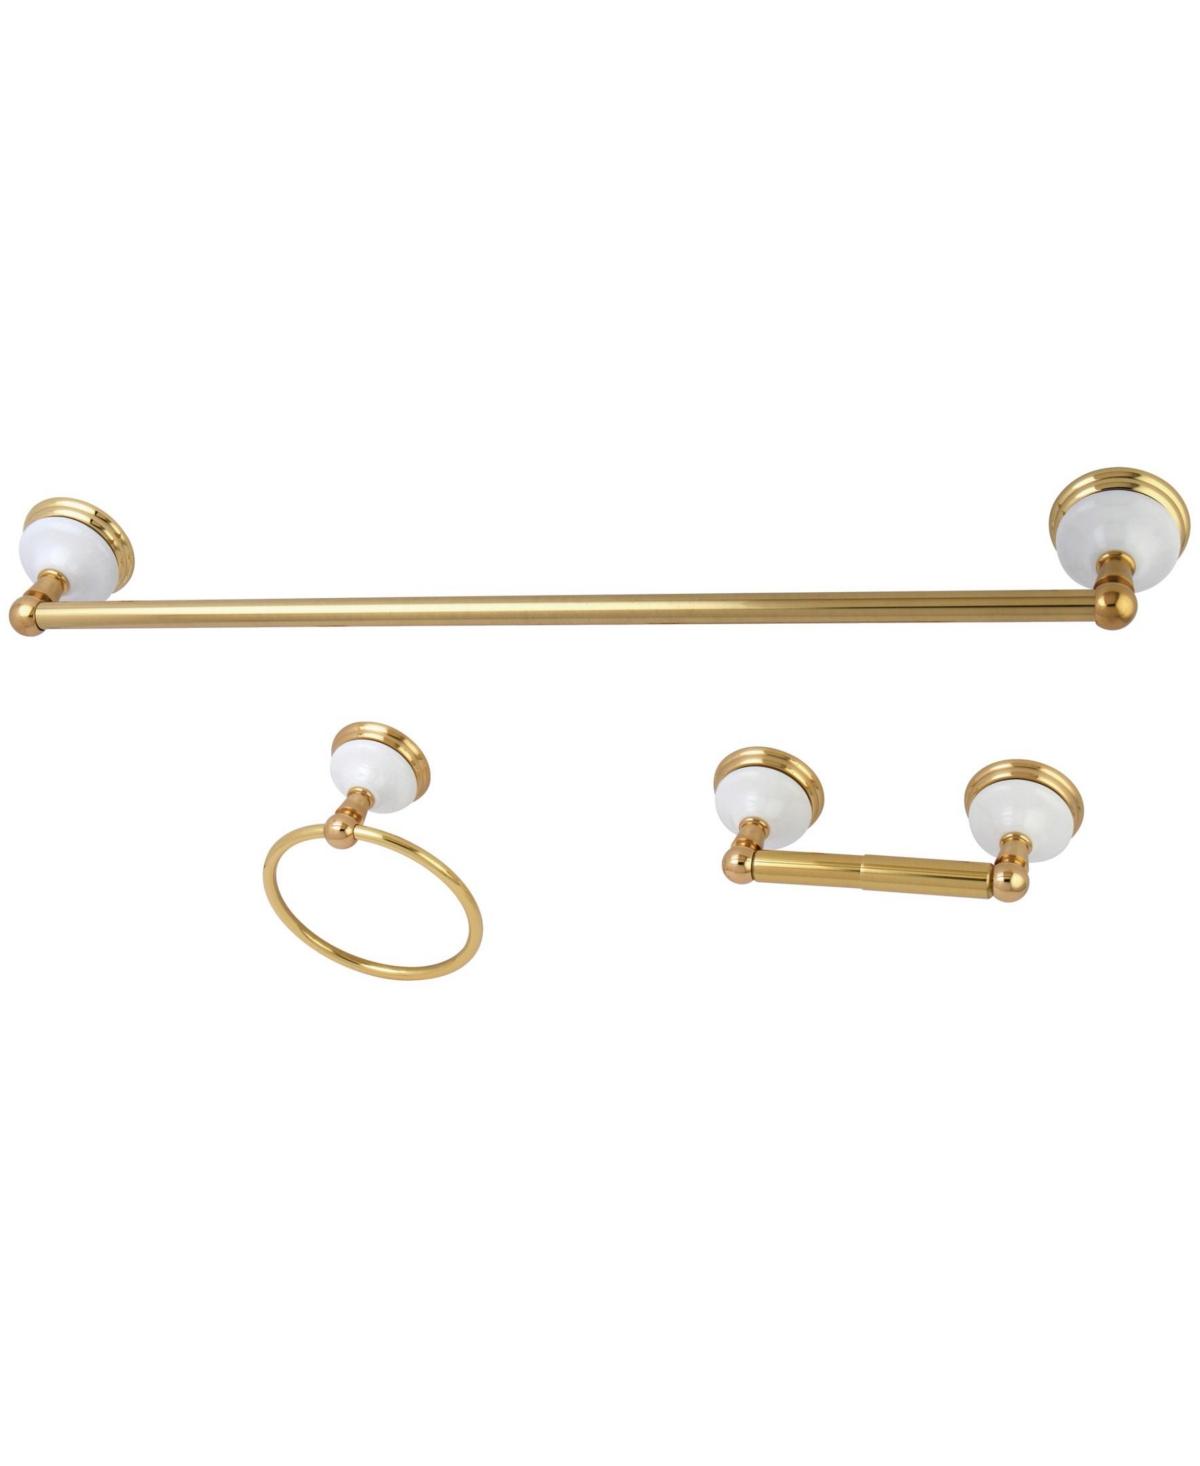 Kingston Brass Victorian 3-Pc. Towel Bar Bathroom Hardware Set Bedding